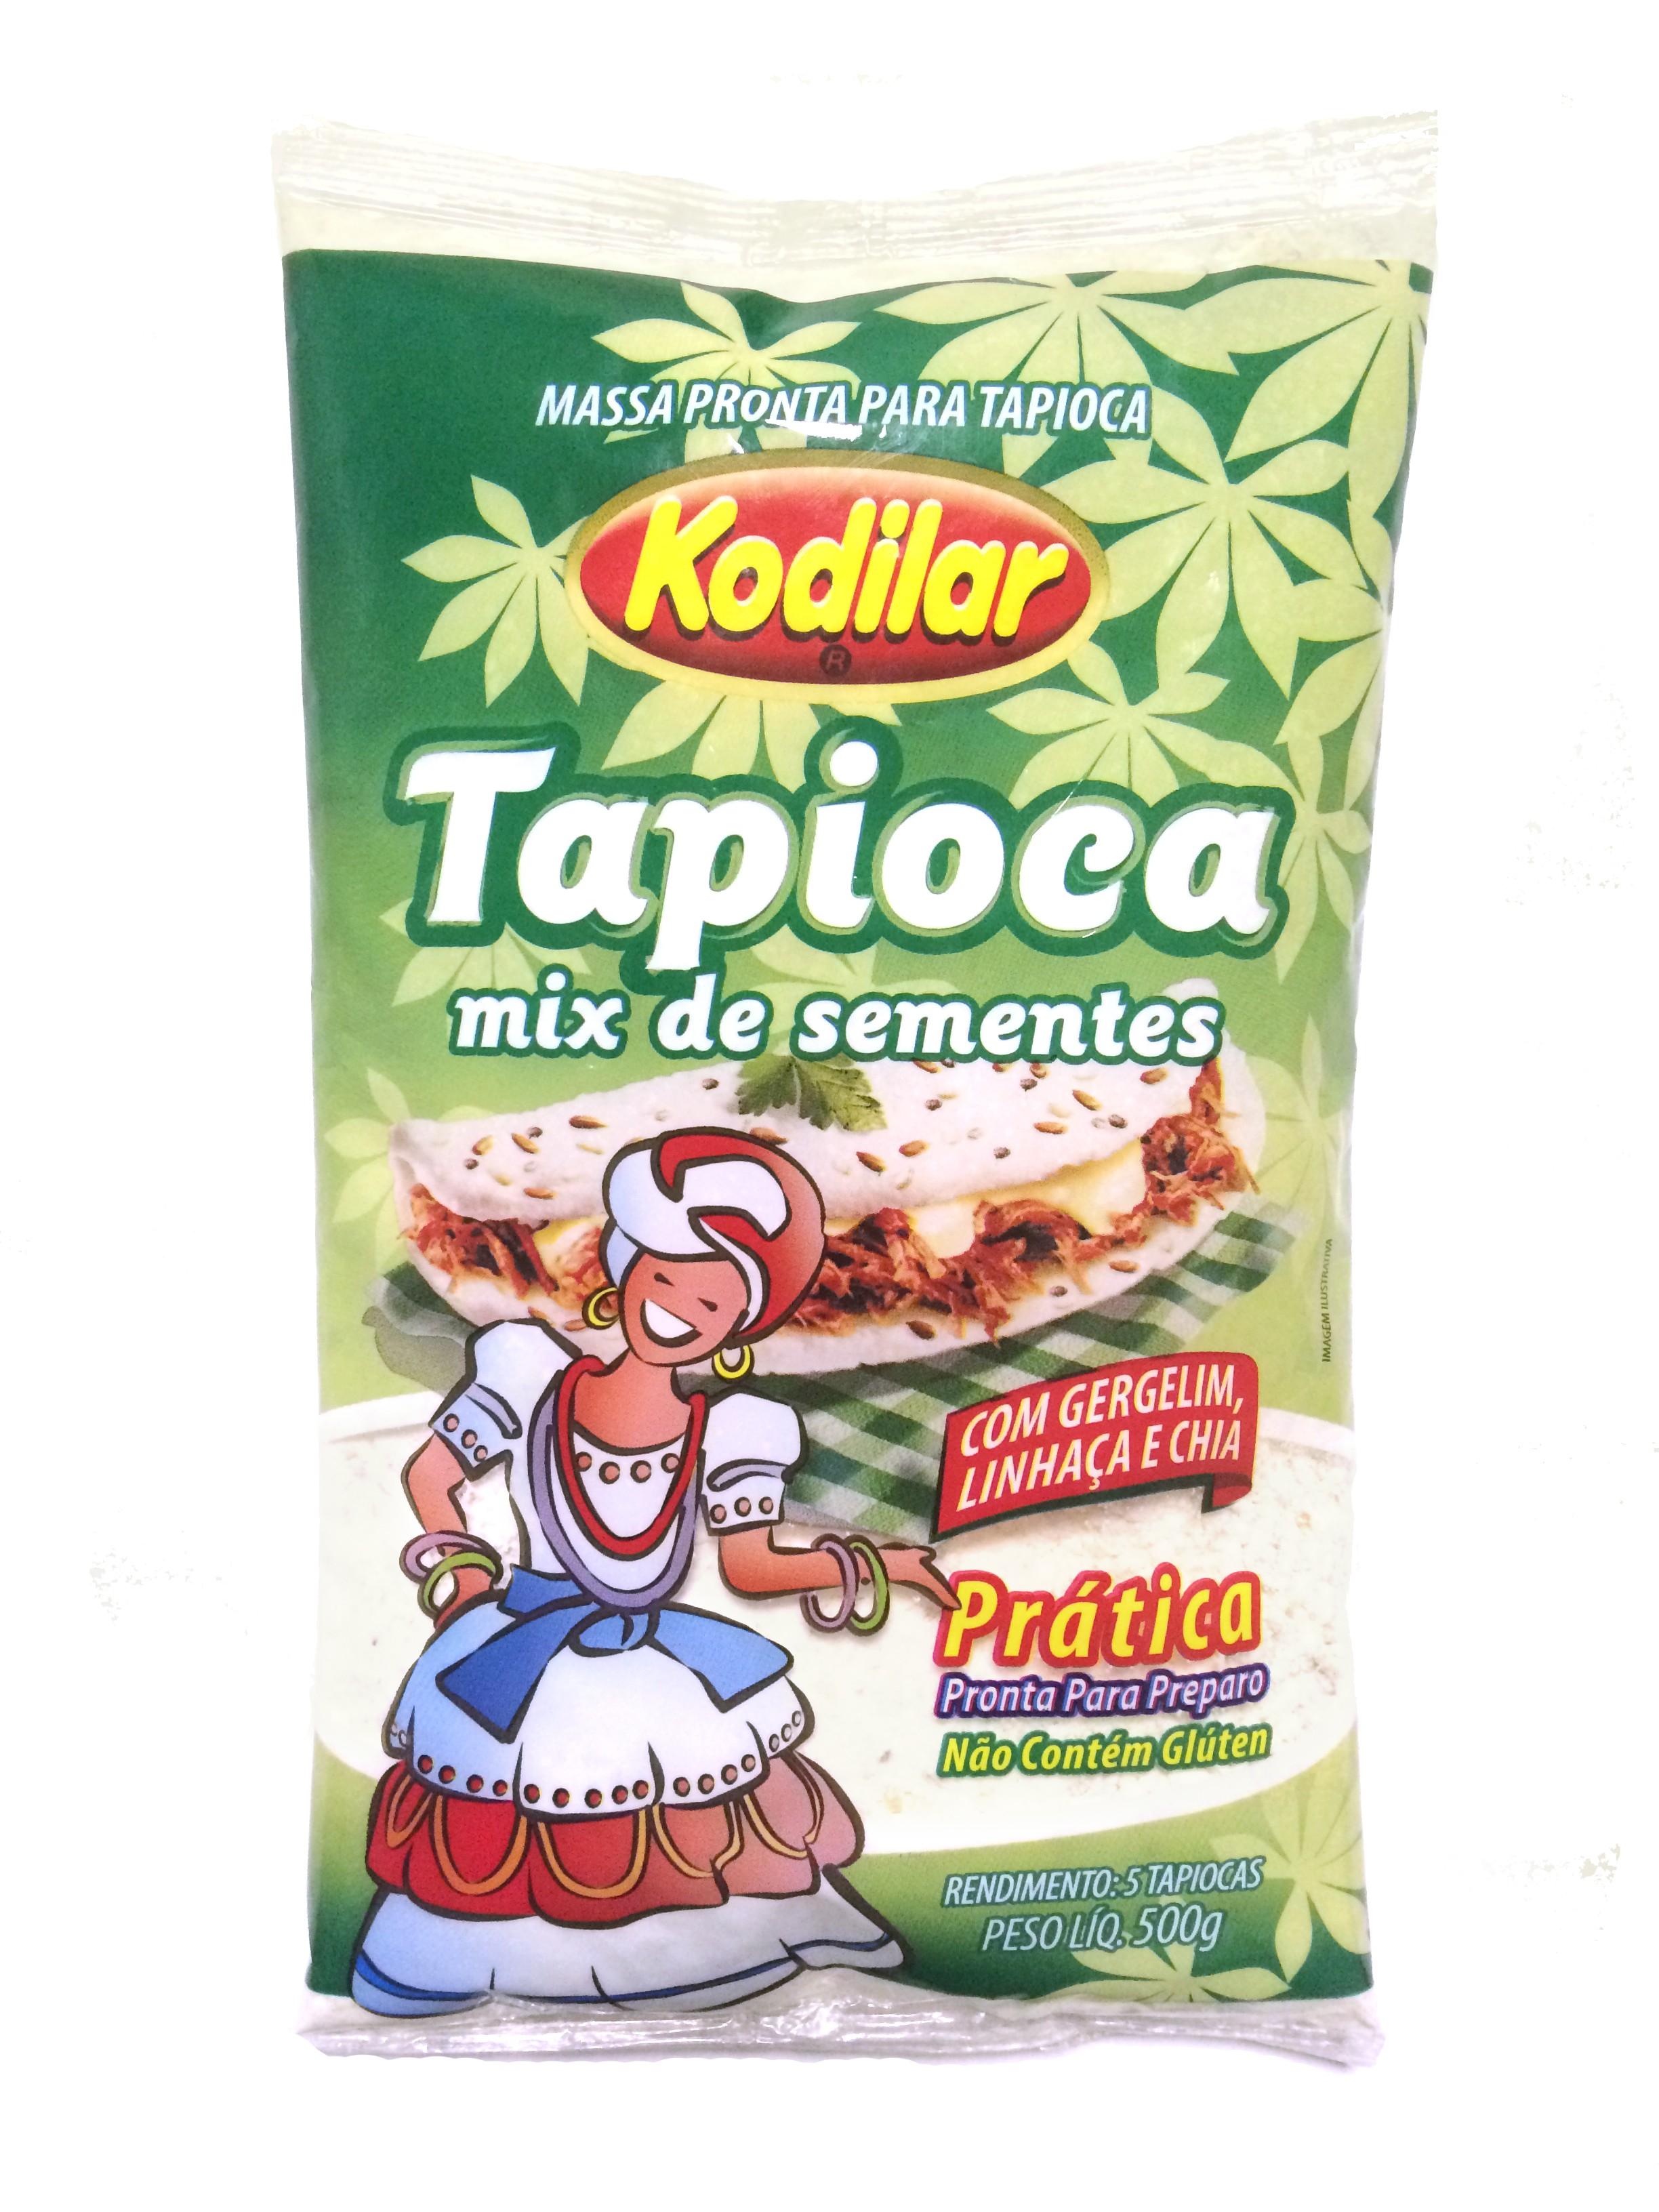 Tapioca Mix de Sementes (500g) - Kodilar